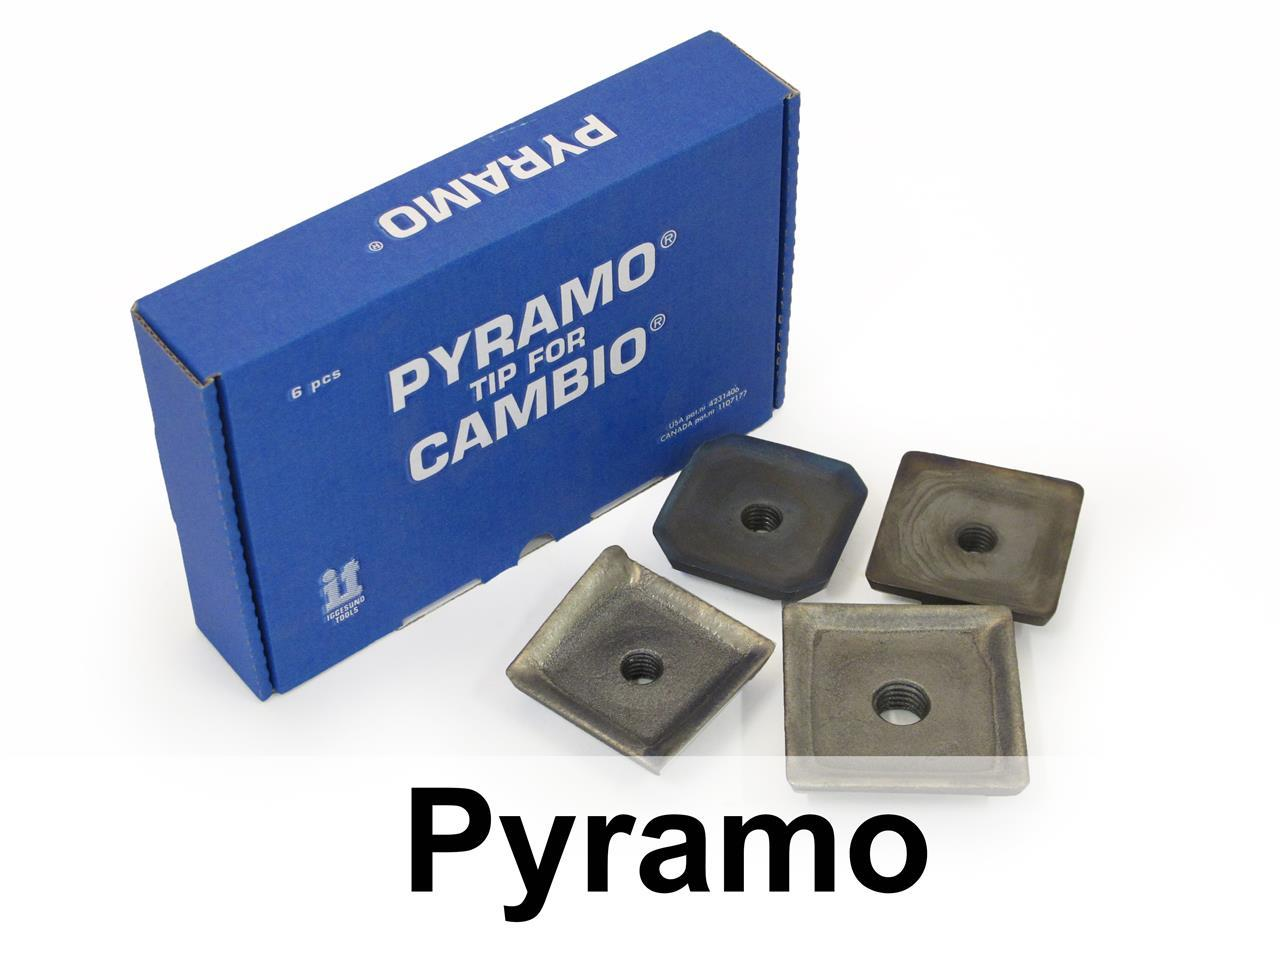 Pyramo tip for Cambio Debarker